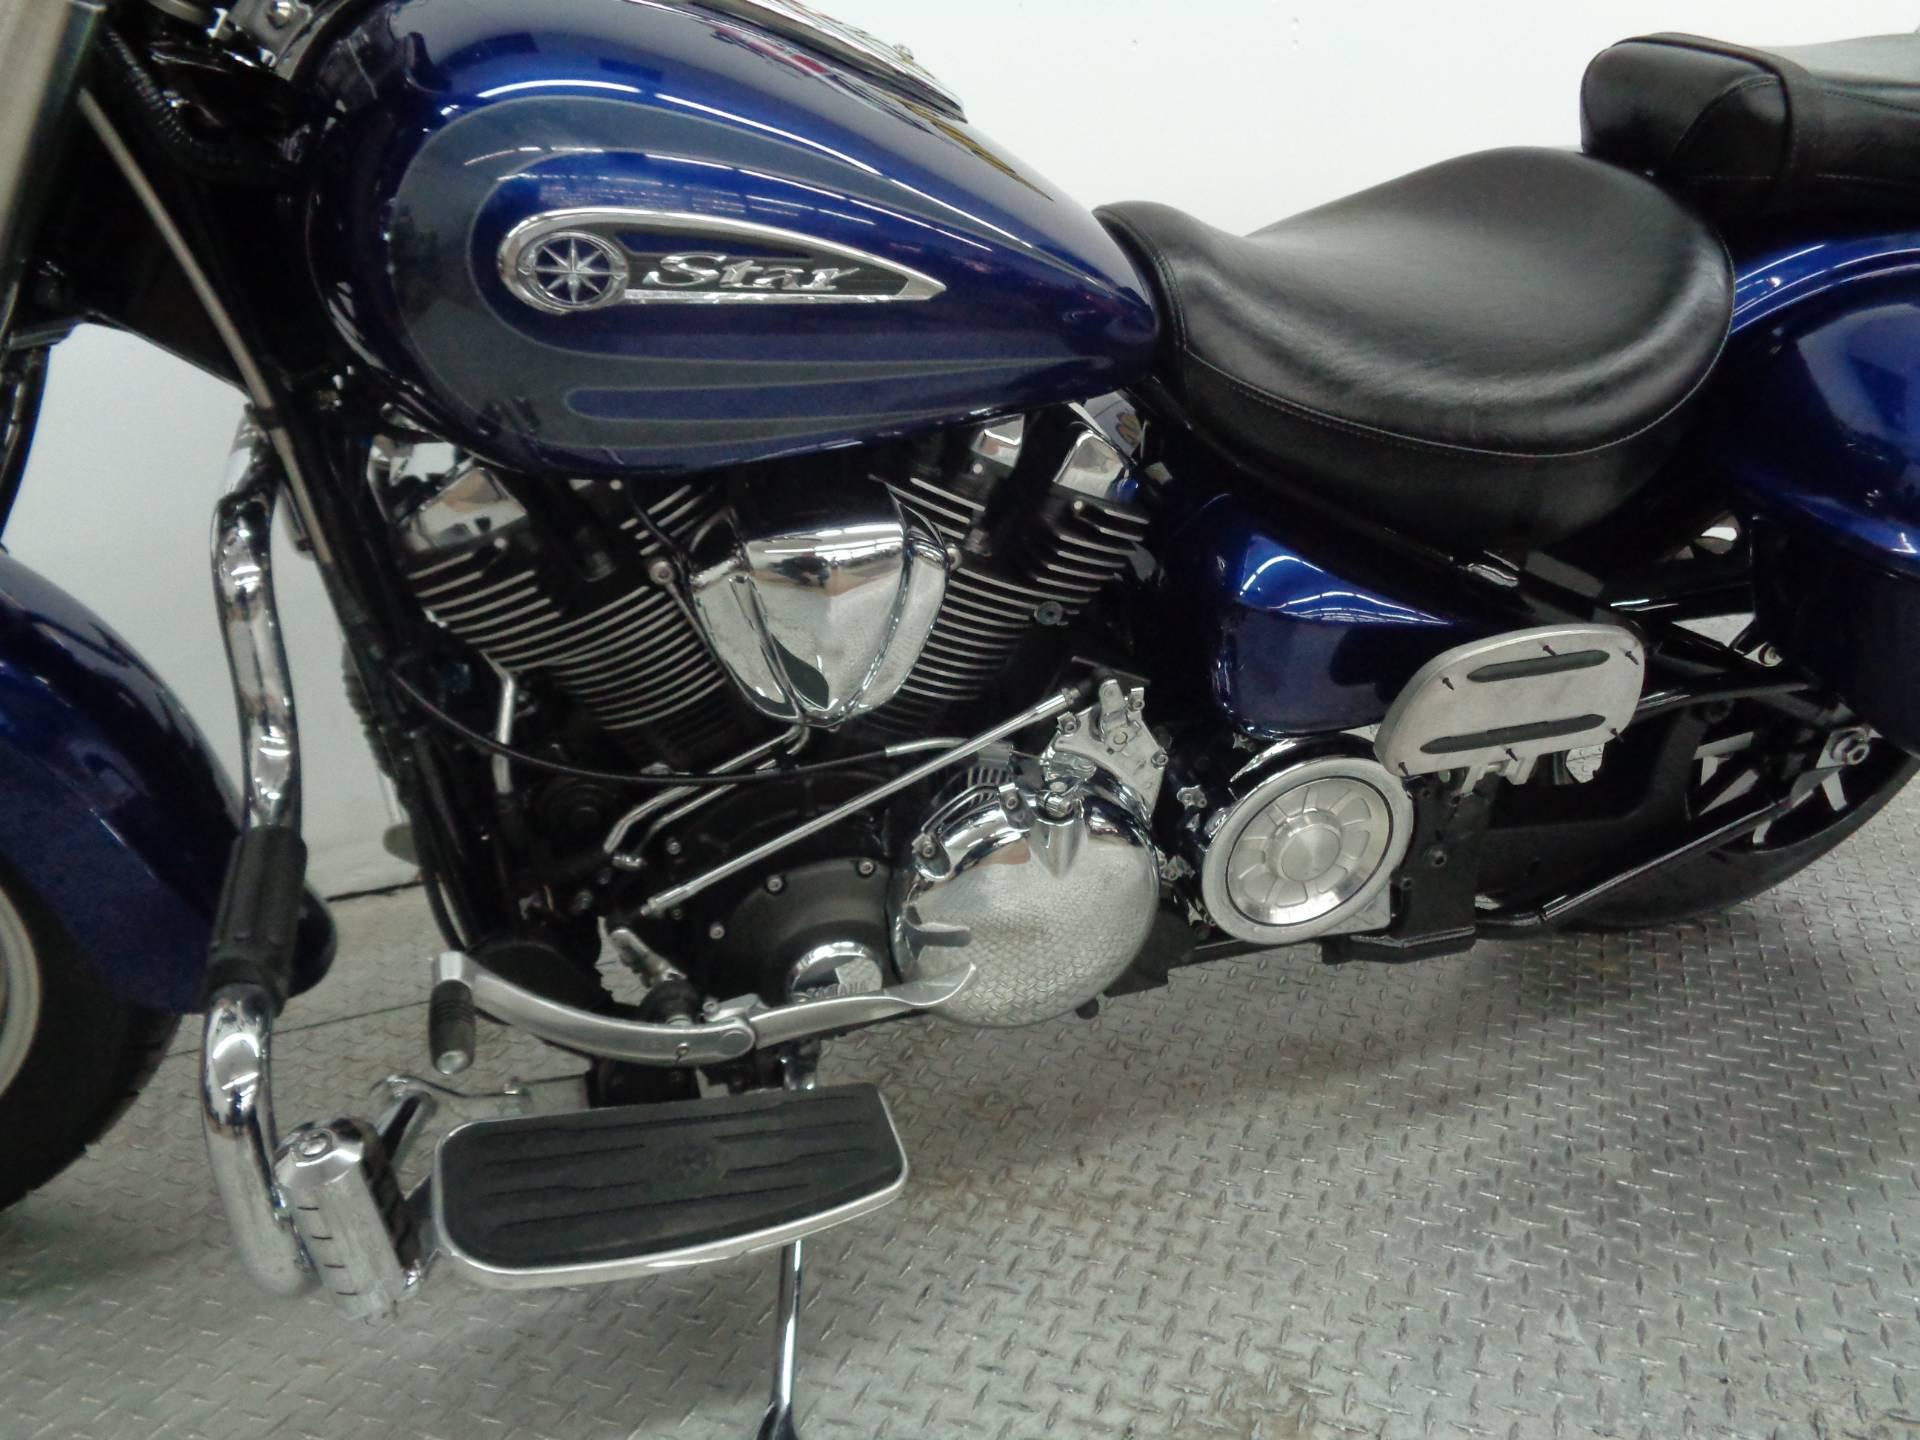 2008 Yamaha Road Star 7